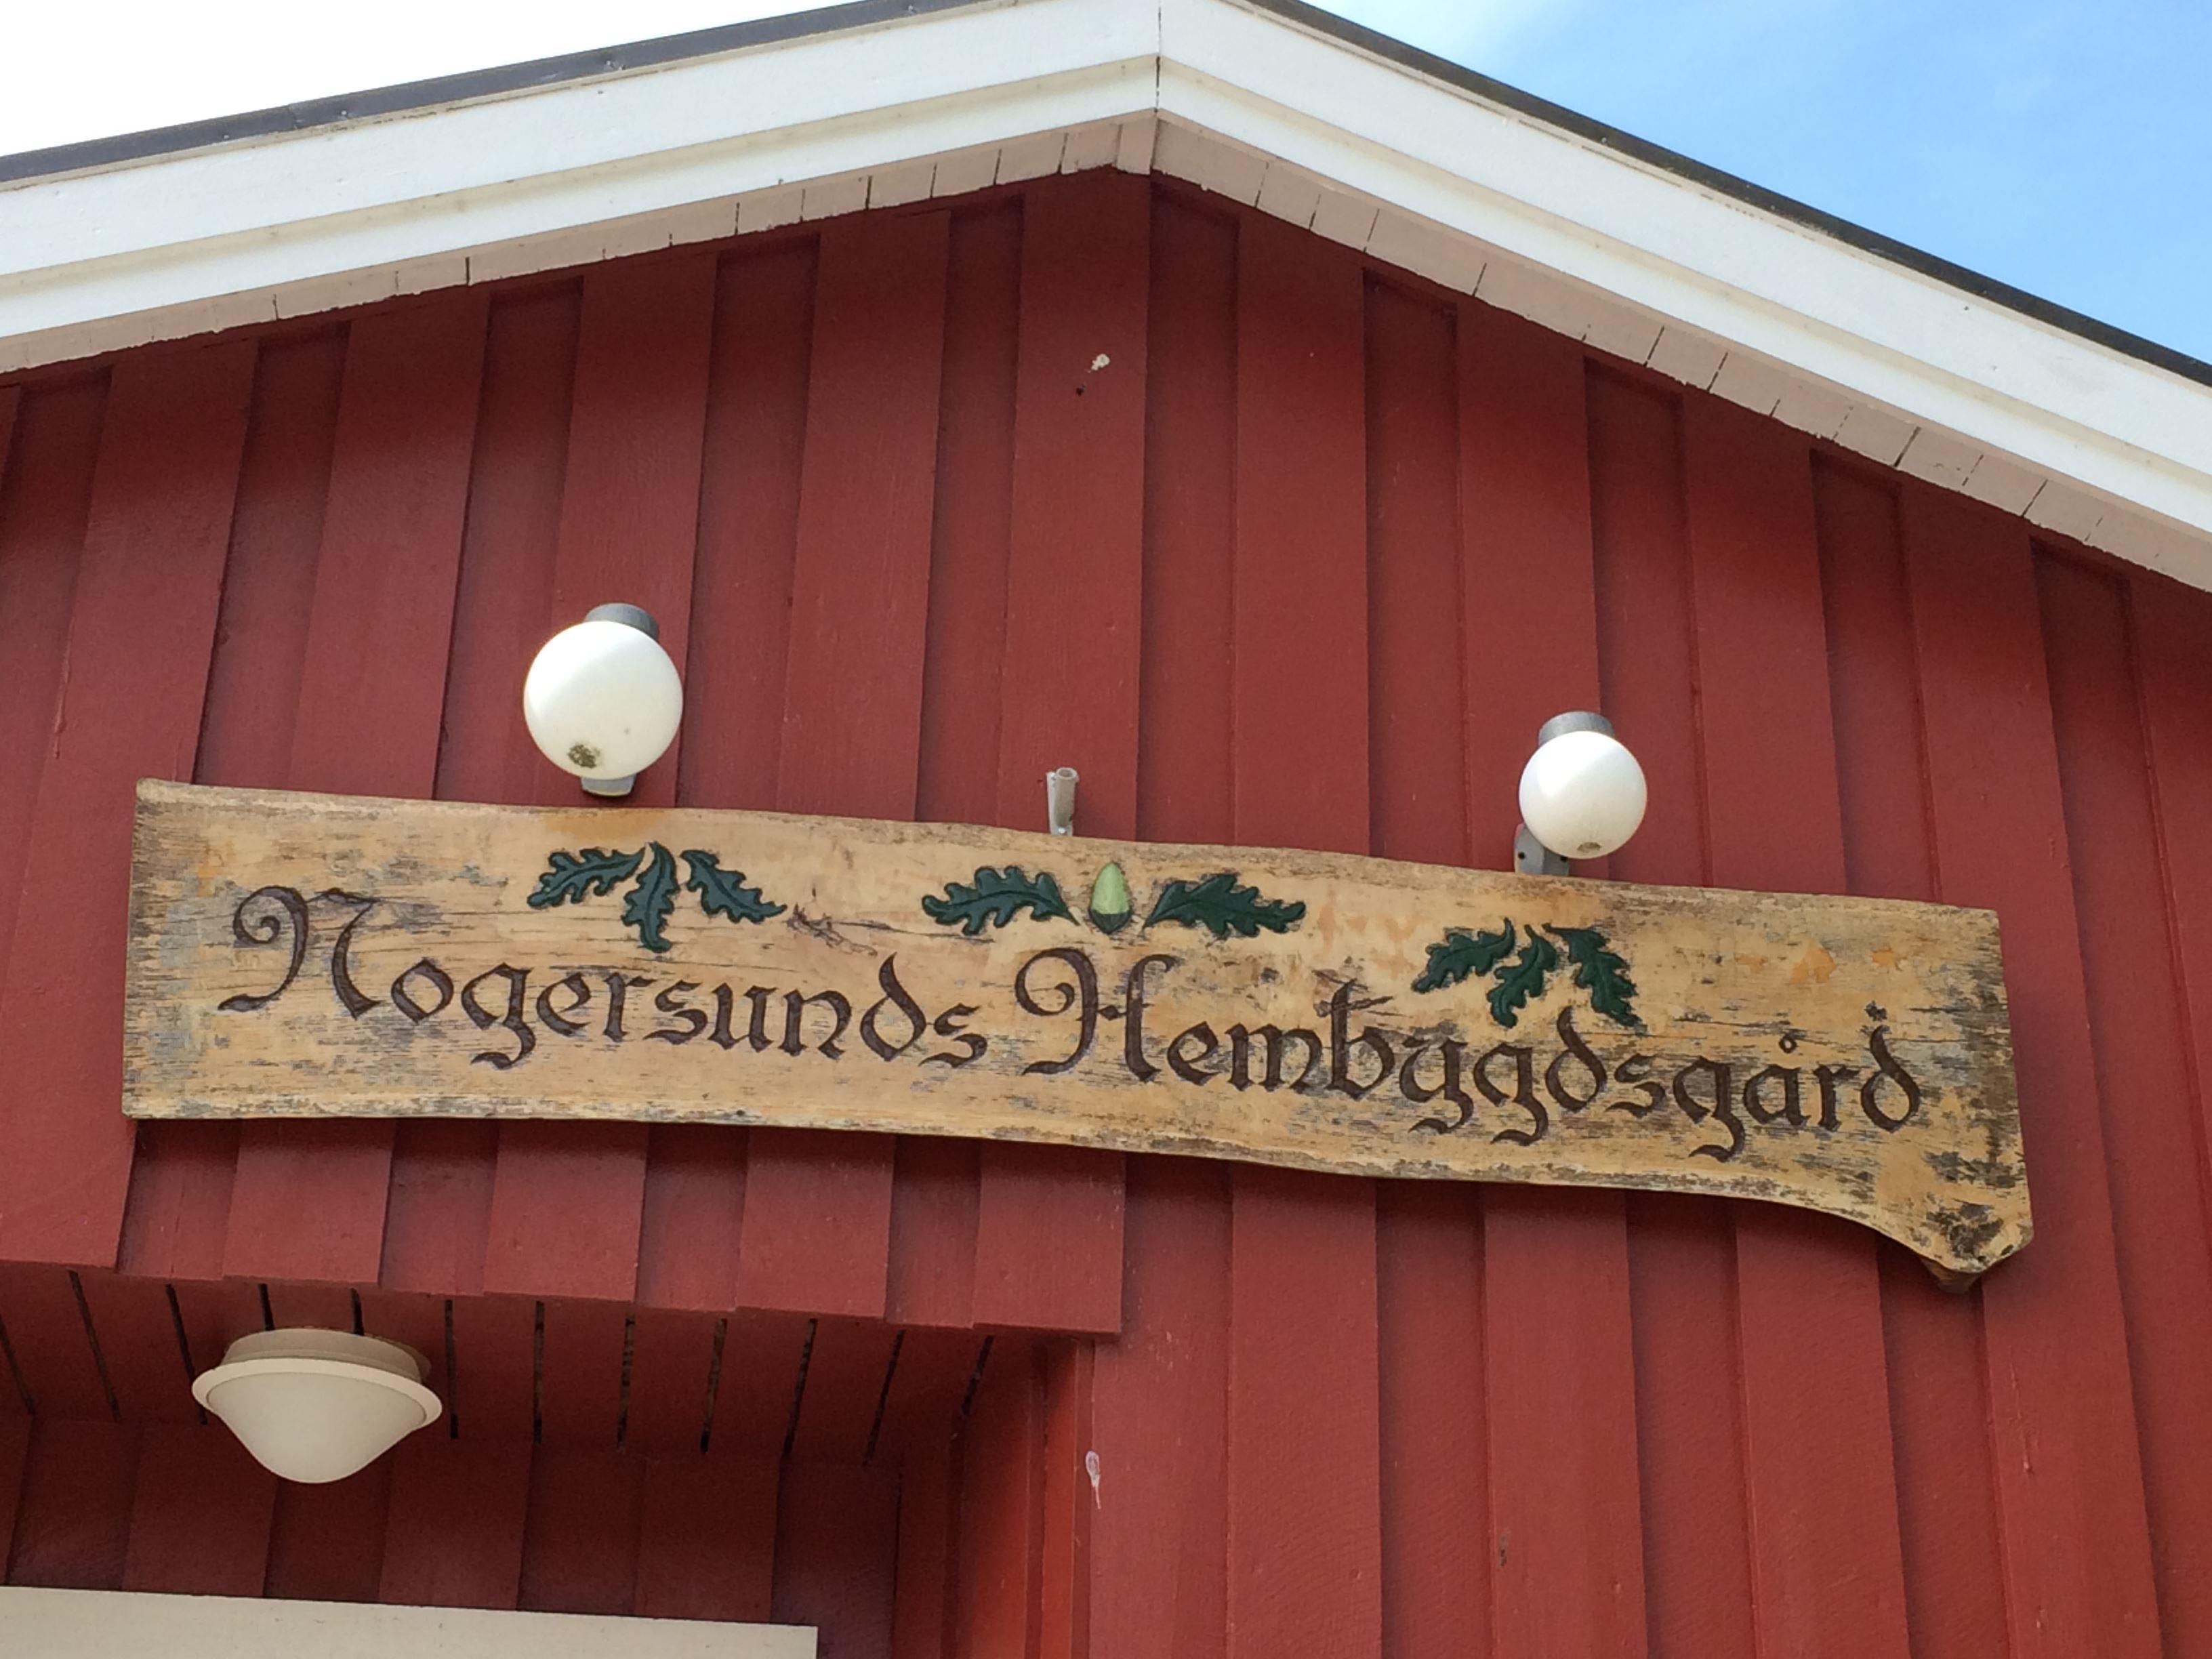 Midsommarfirande i Nogersund